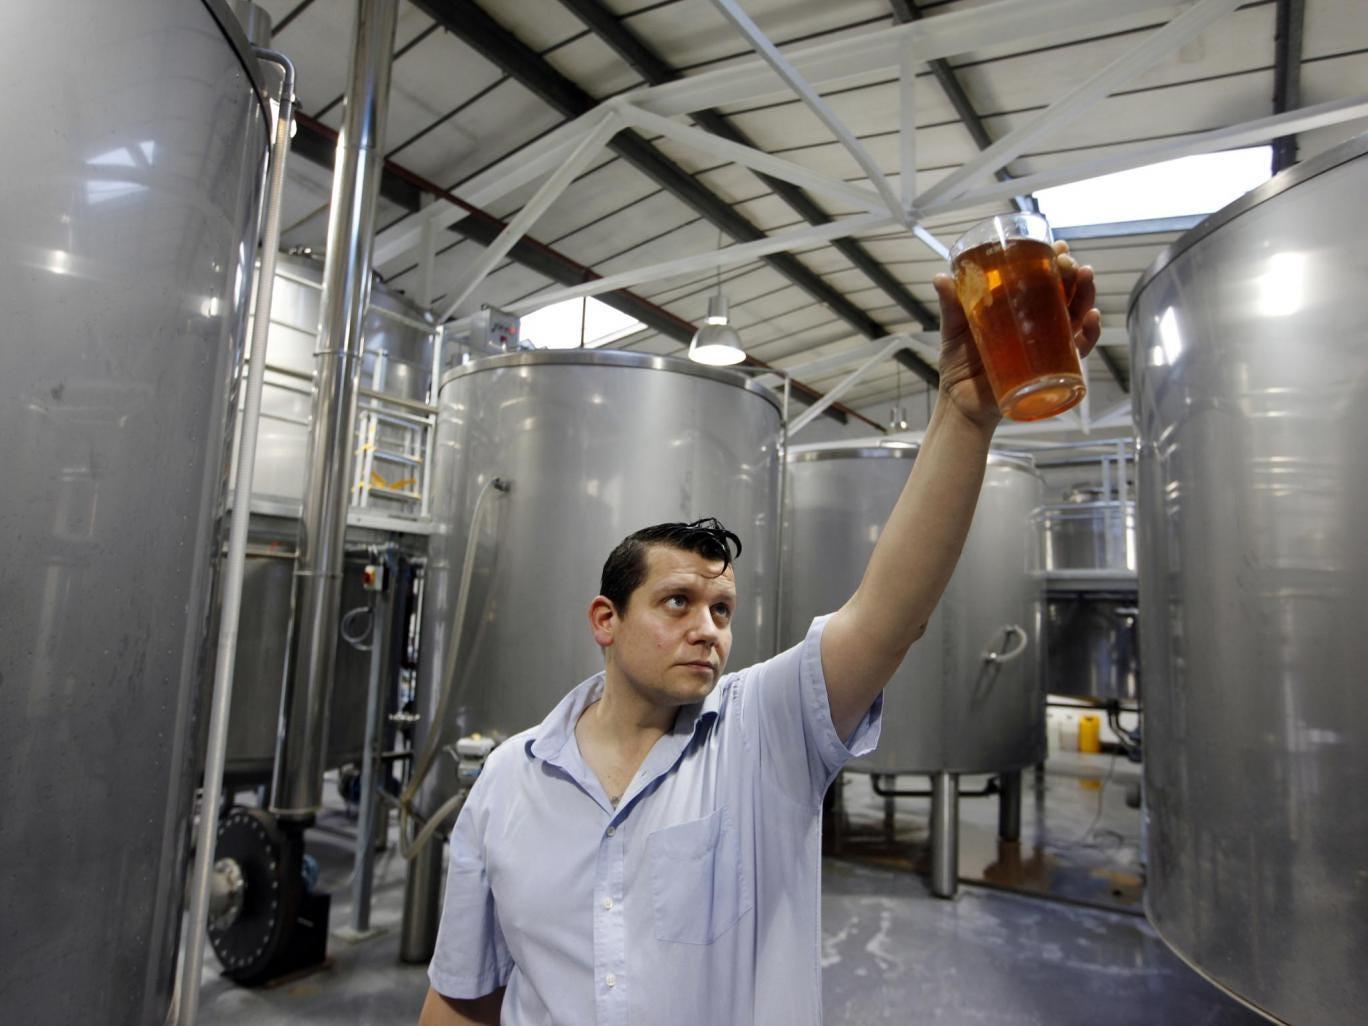 Beer baron: Ben Ott inspects his product